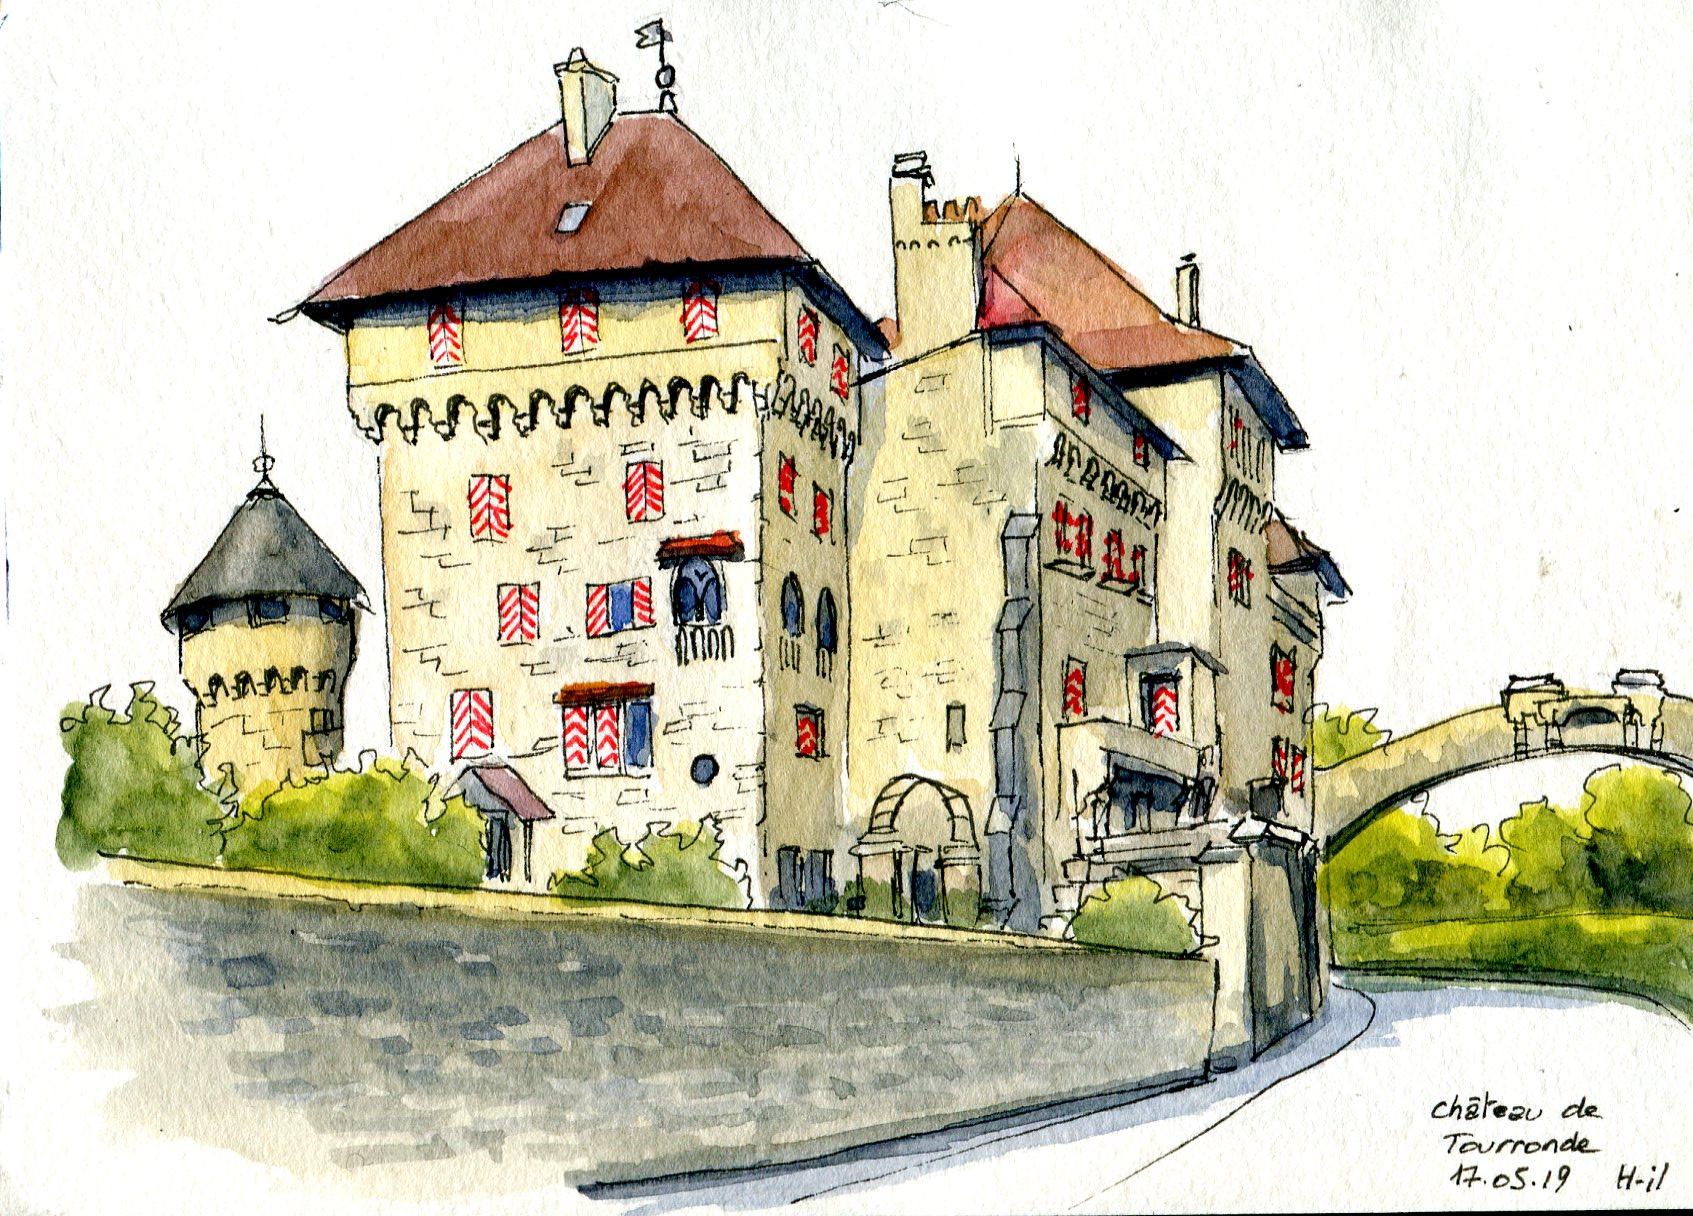 Château_de_Tourronde